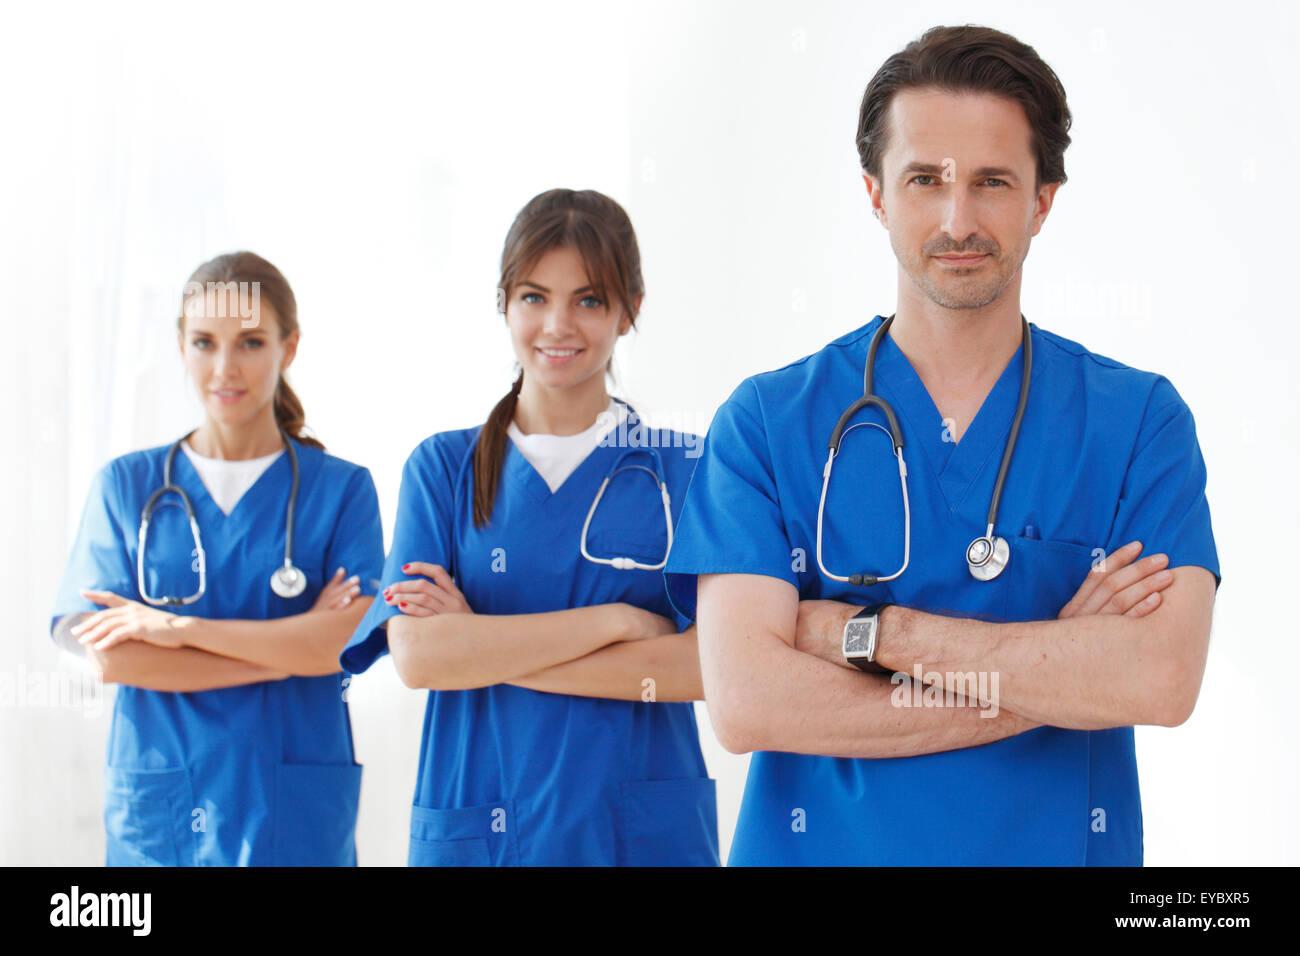 team of doctors - Stock Image